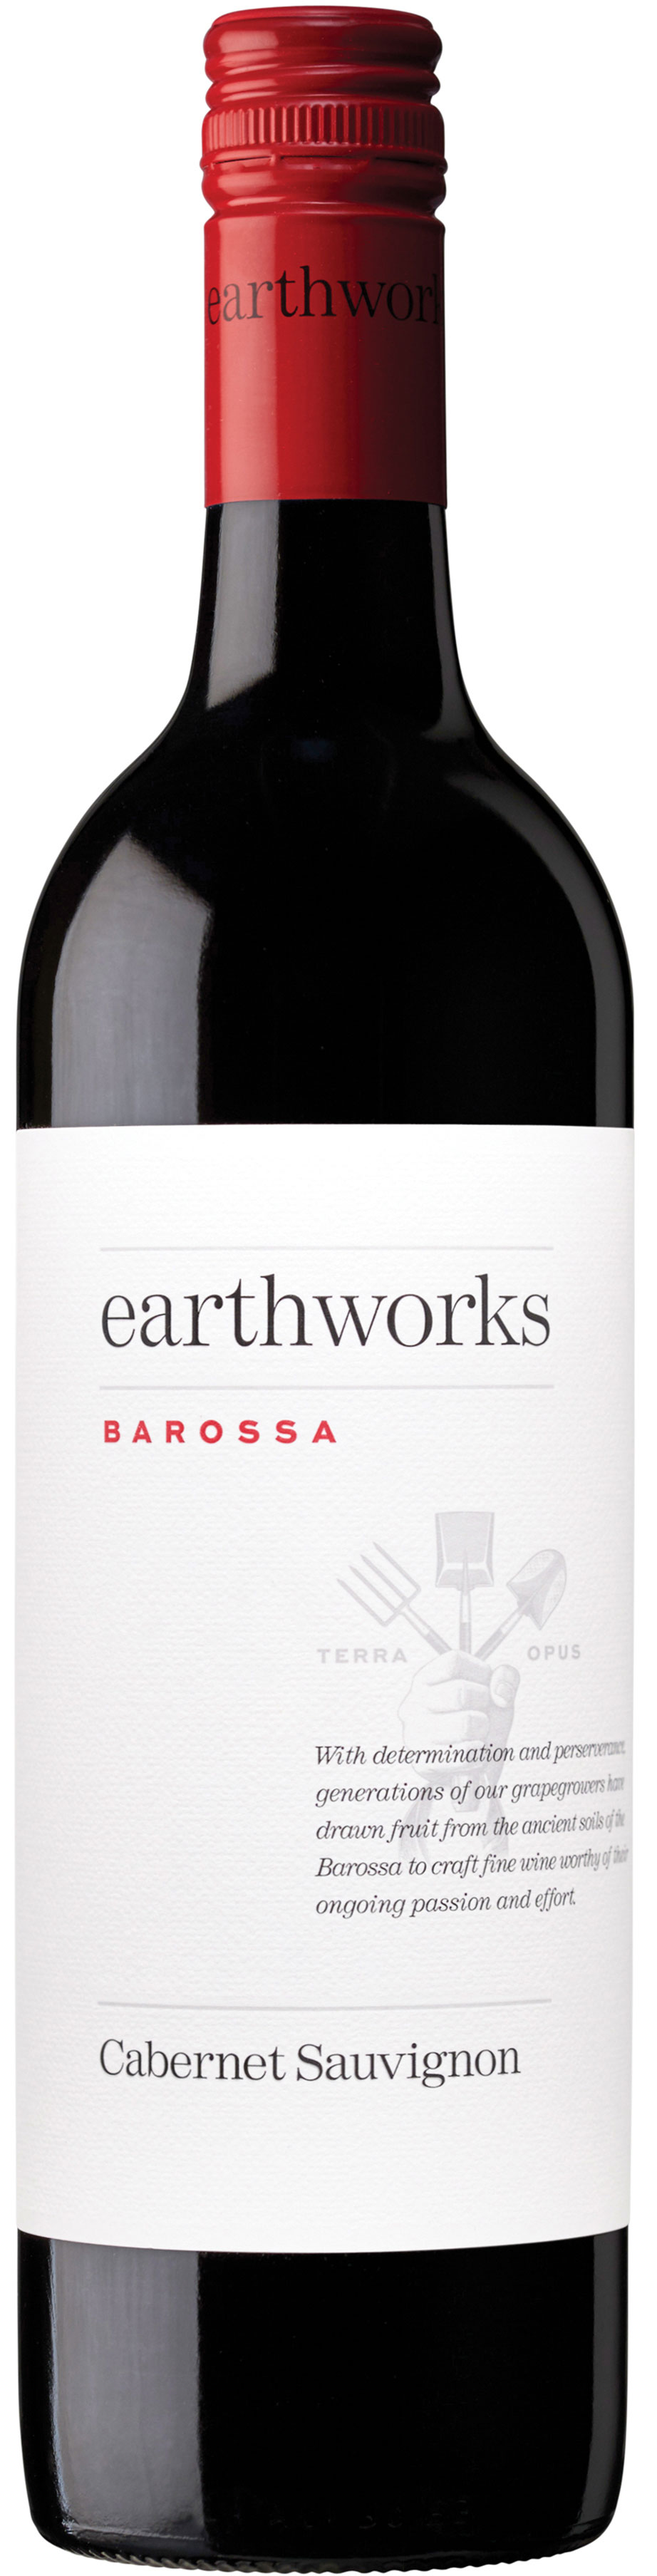 https://vinocorpperu.com/images/vinos/earthworks/earthworks_barossa_cabernet_sauvignon_2017.jpg